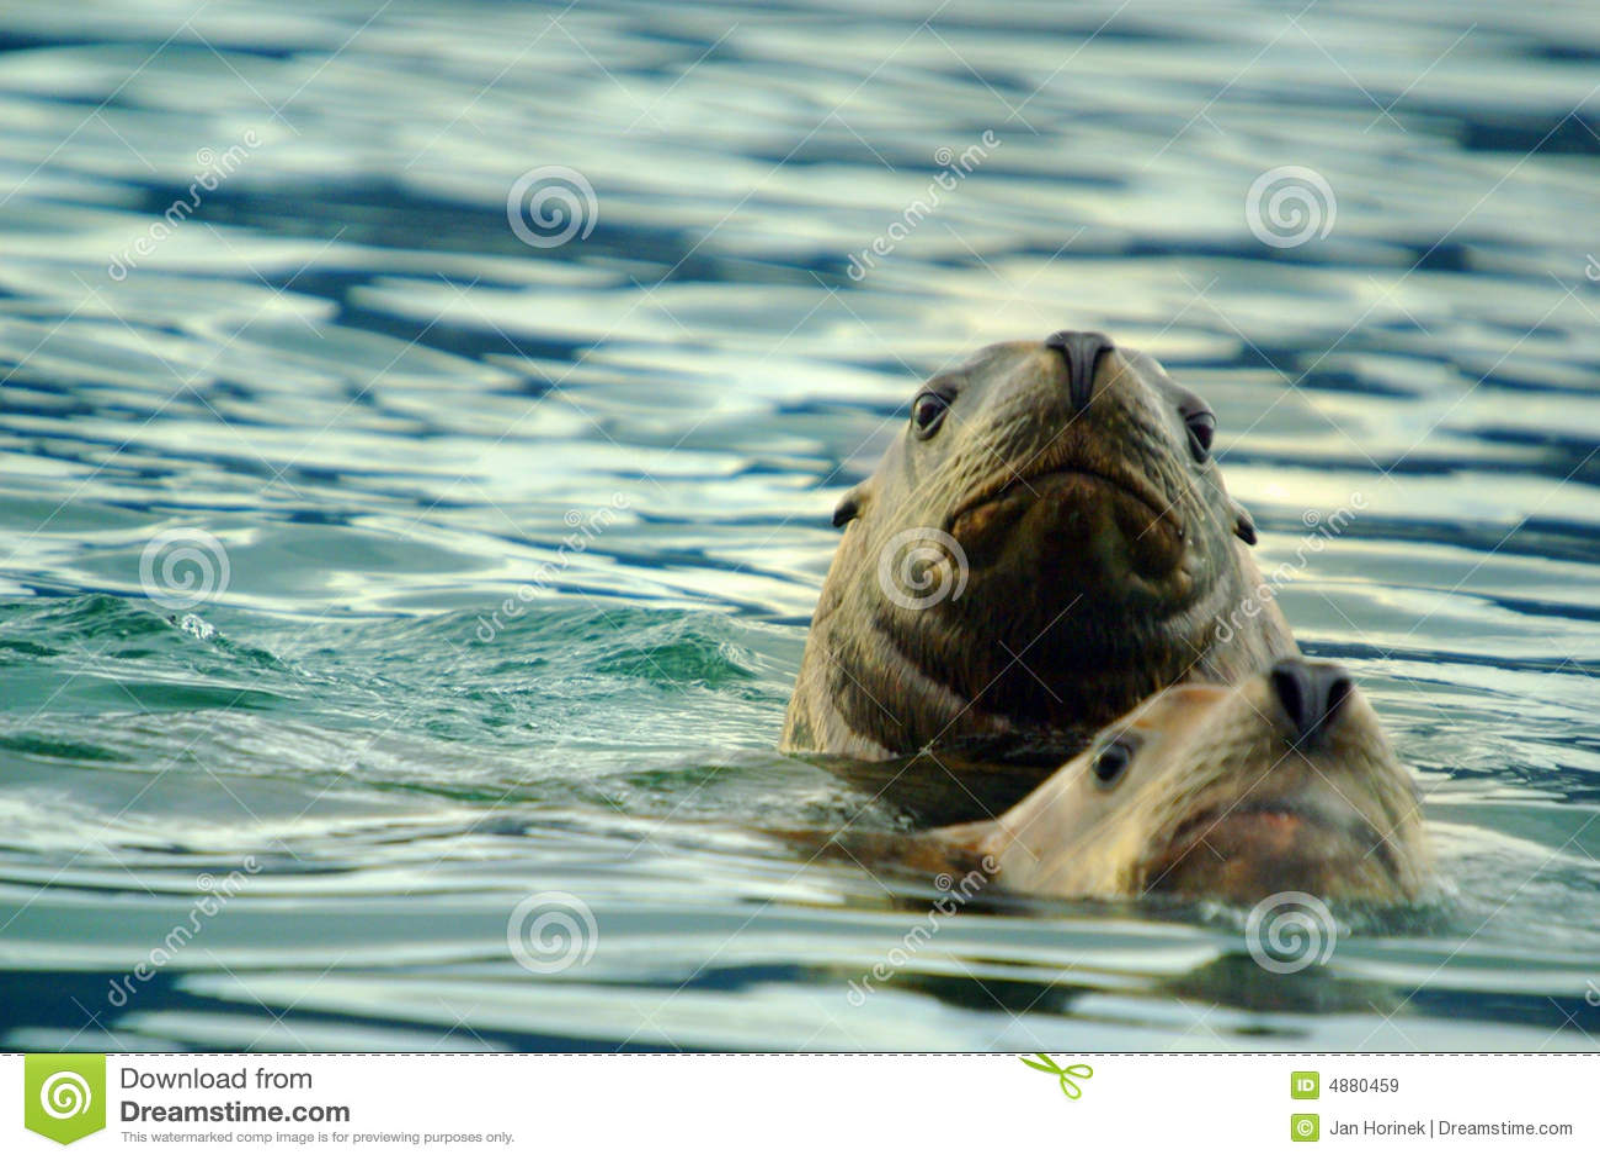 Sea lions pair